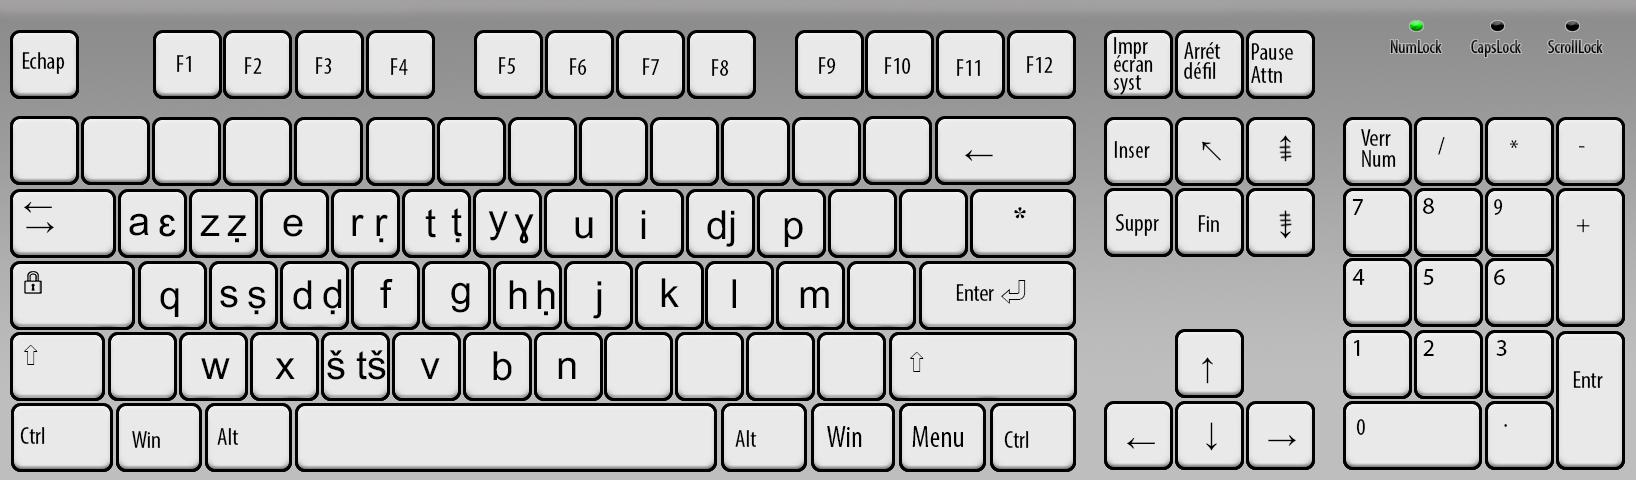 Tamazight Fonts Guide - happy05dz